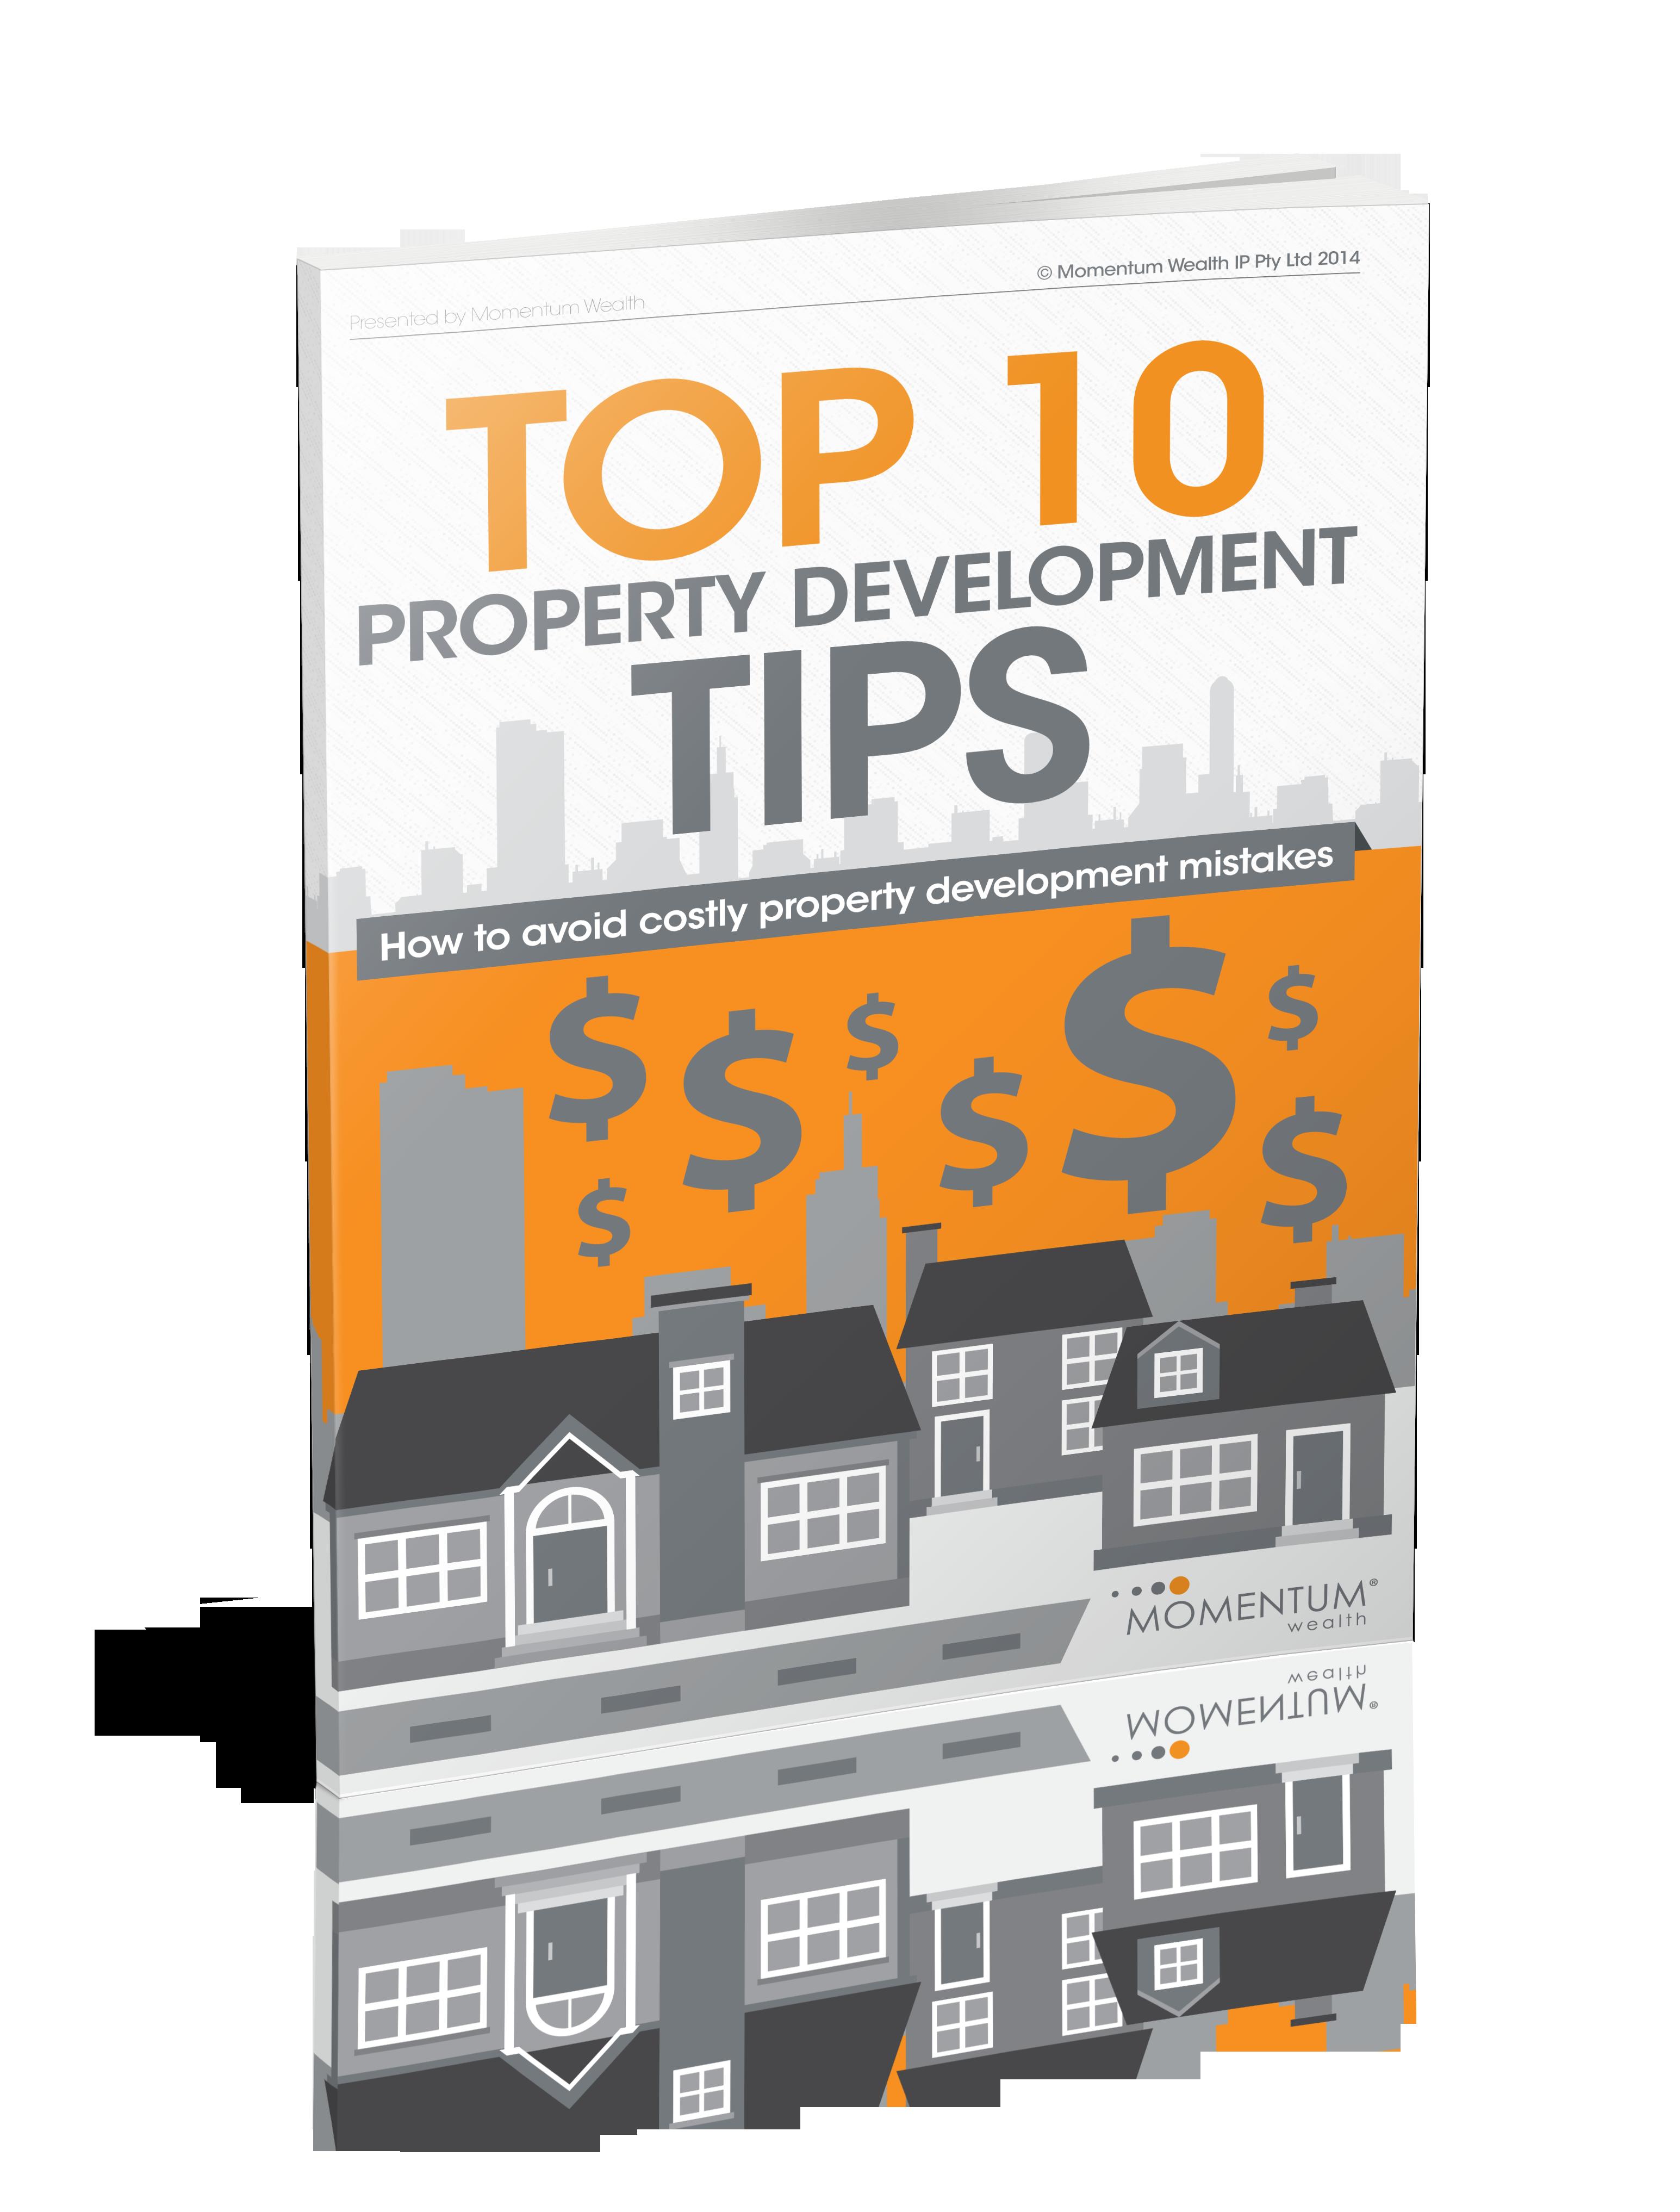 Top 10 Property development tips